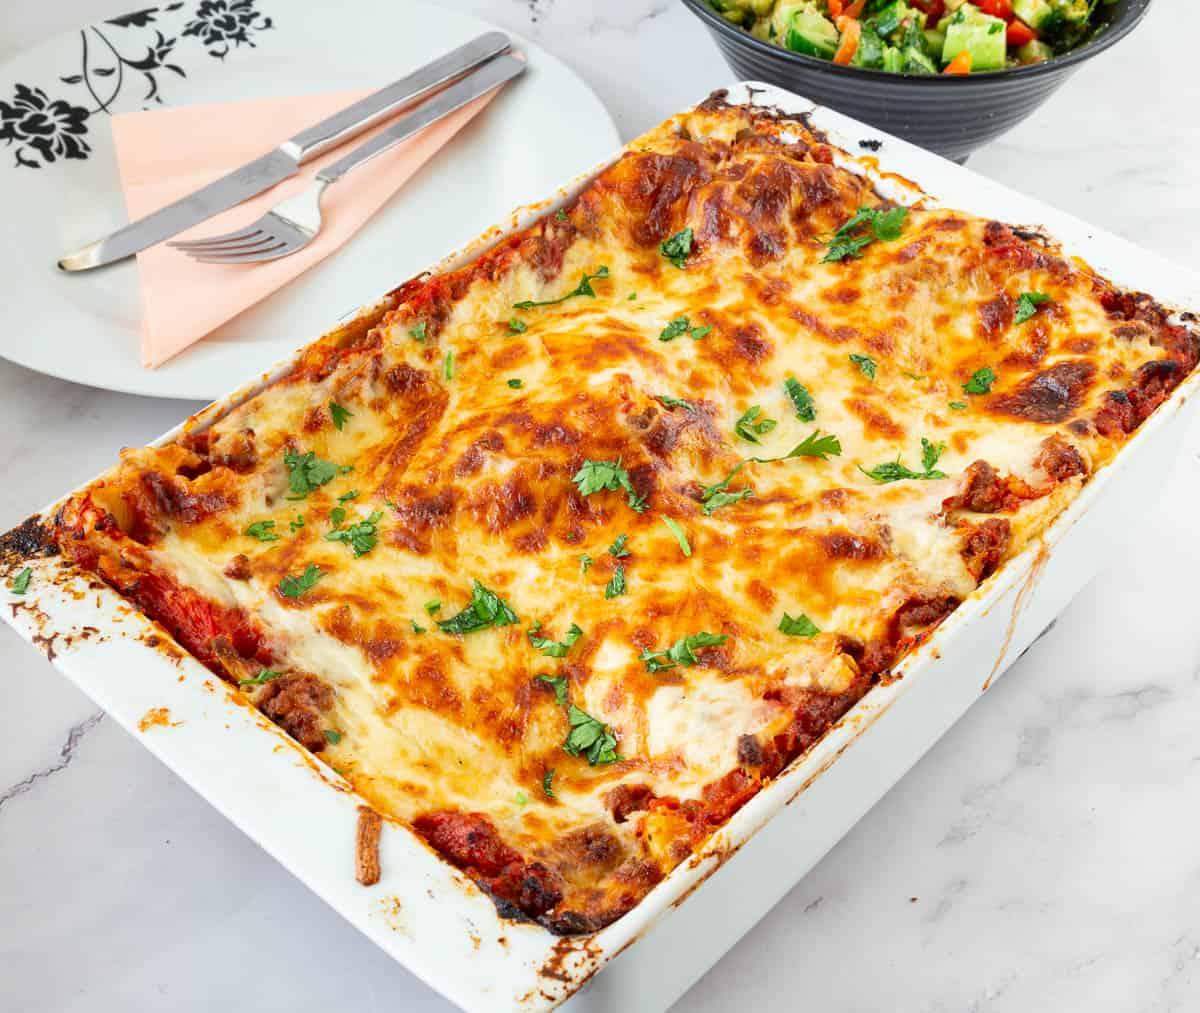 Baked lasagna in a ceramic casserole dish.